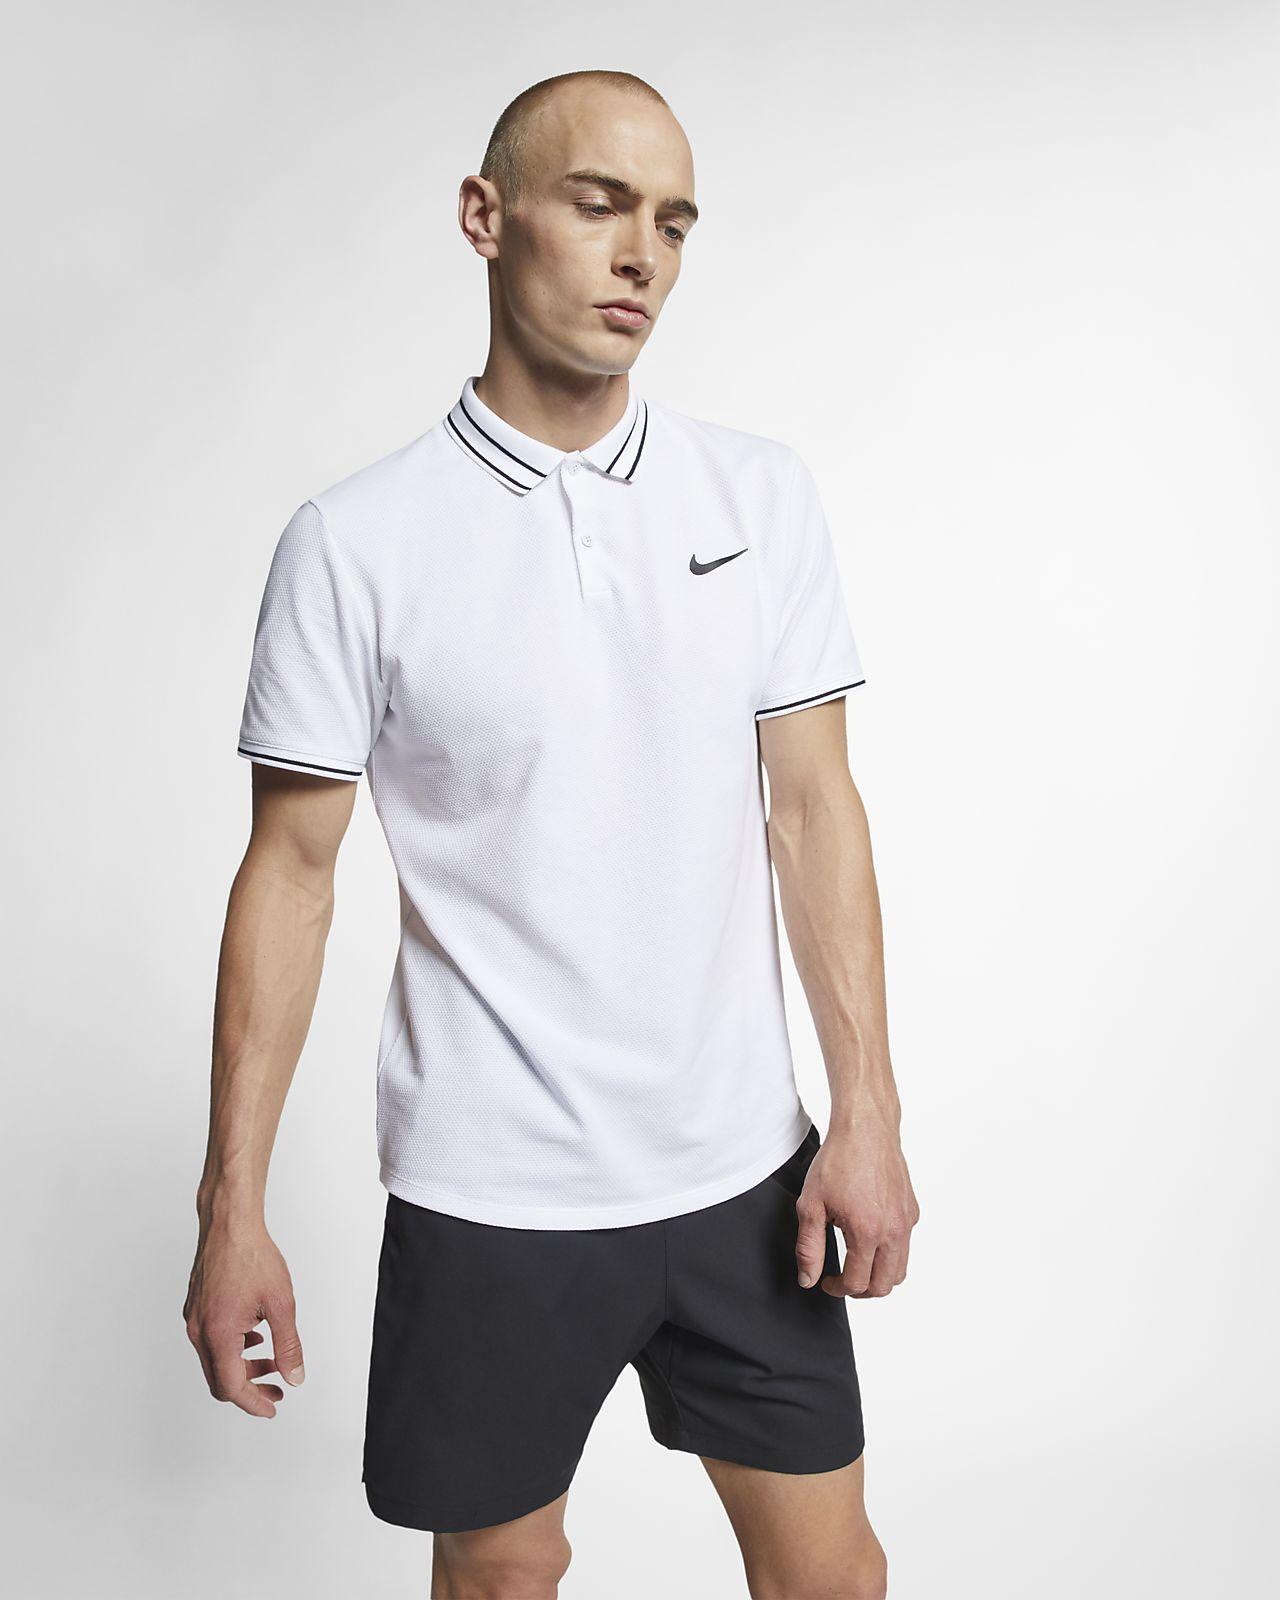 NikeCourt Advantage tennispikétröja för män